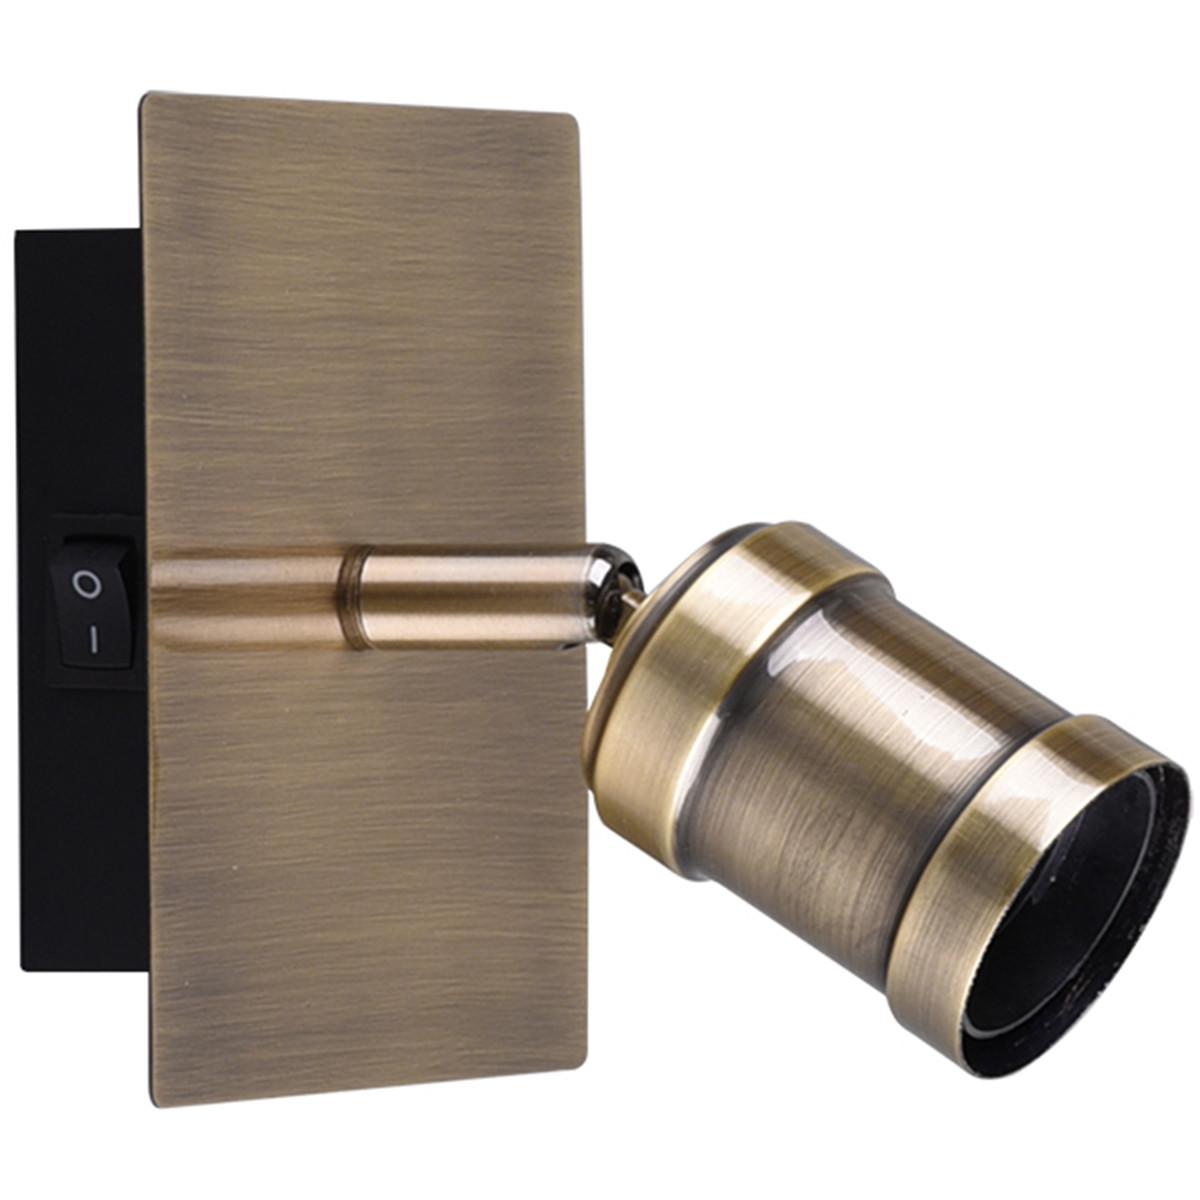 LED Wandspot - Trion Korli - E27 Fitting - 1-lichts - Rond - Mat Brons - Aluminium